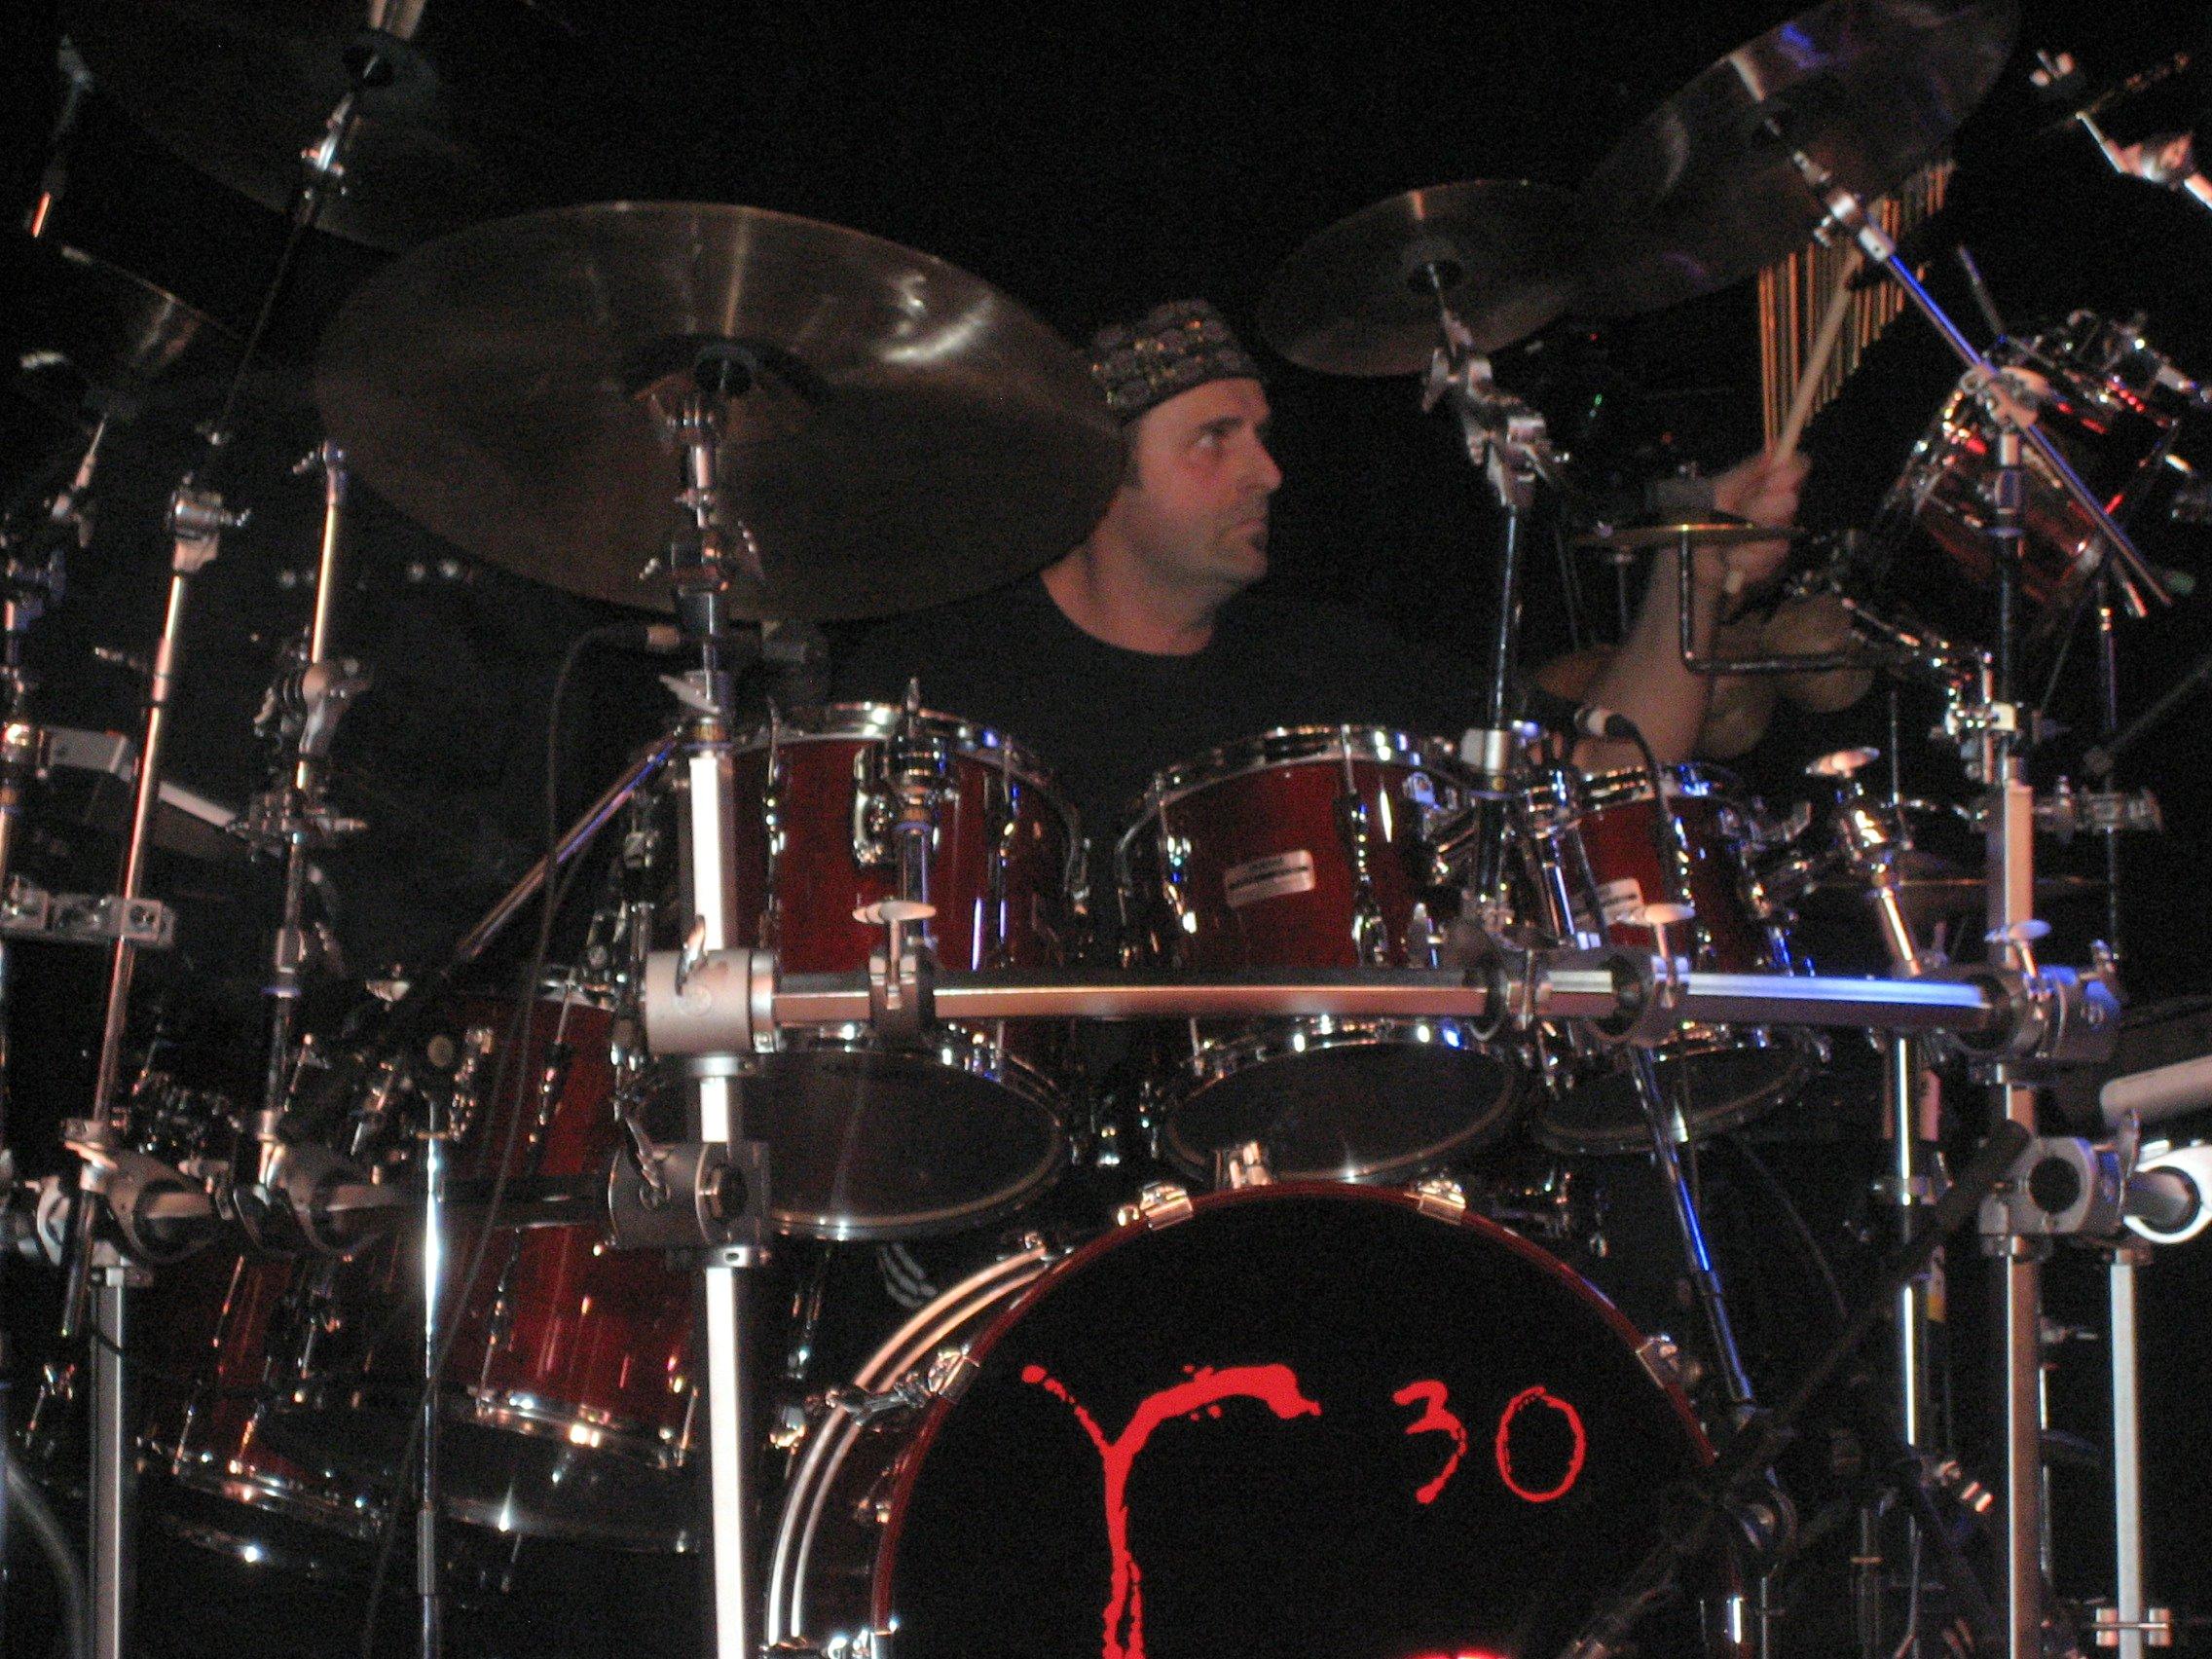 Mike Michalkow